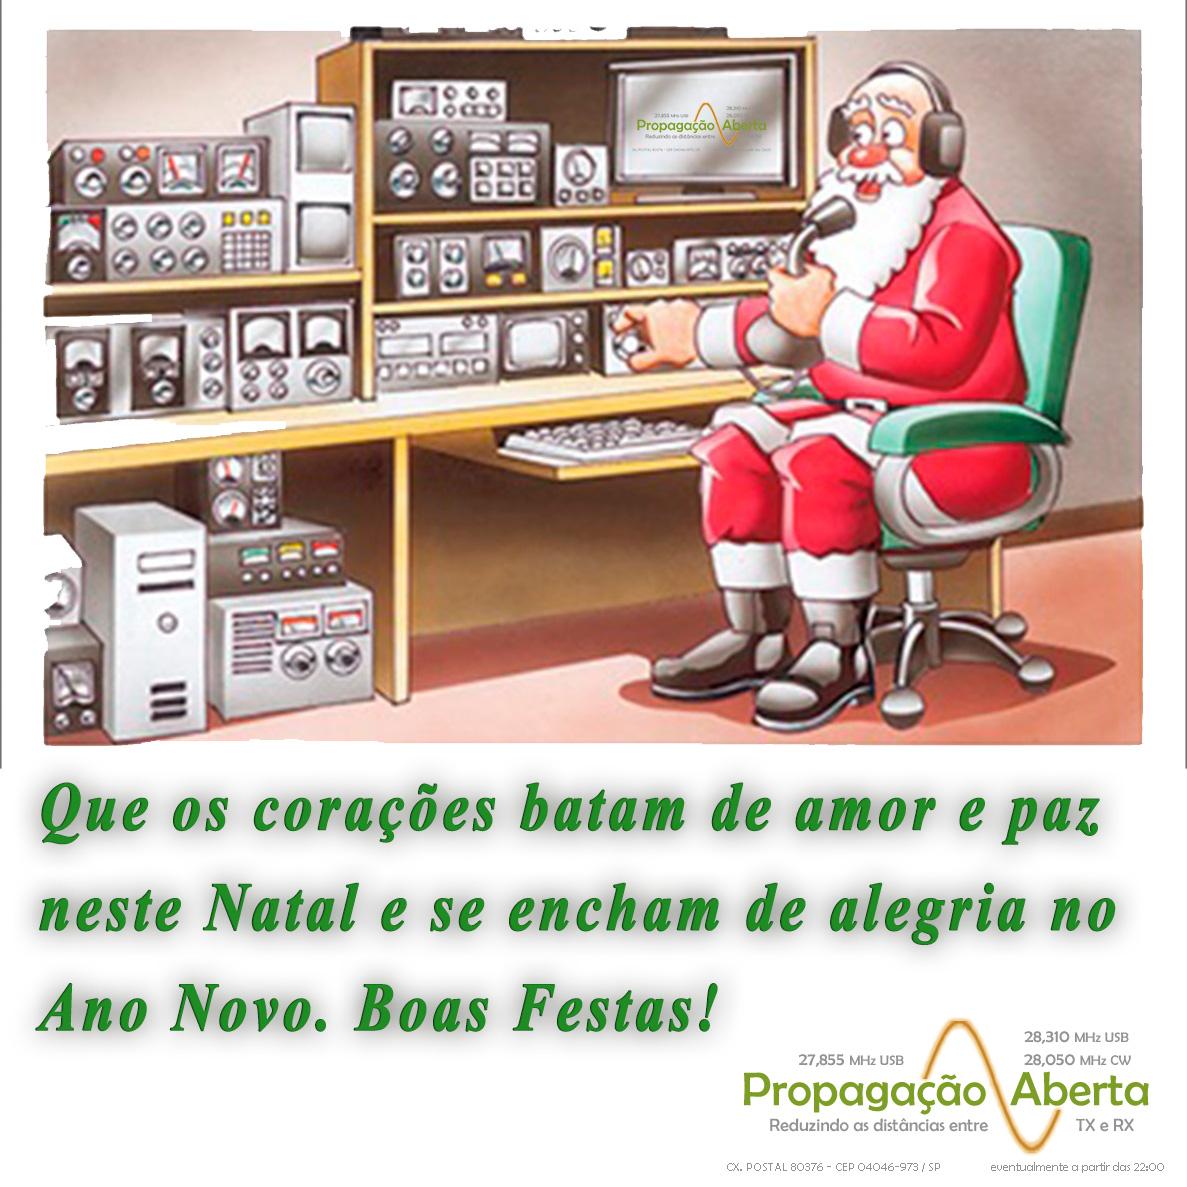 Feliz-Natal-e-Ano-Novo-site-loja-Propagacao-Aberta-2020